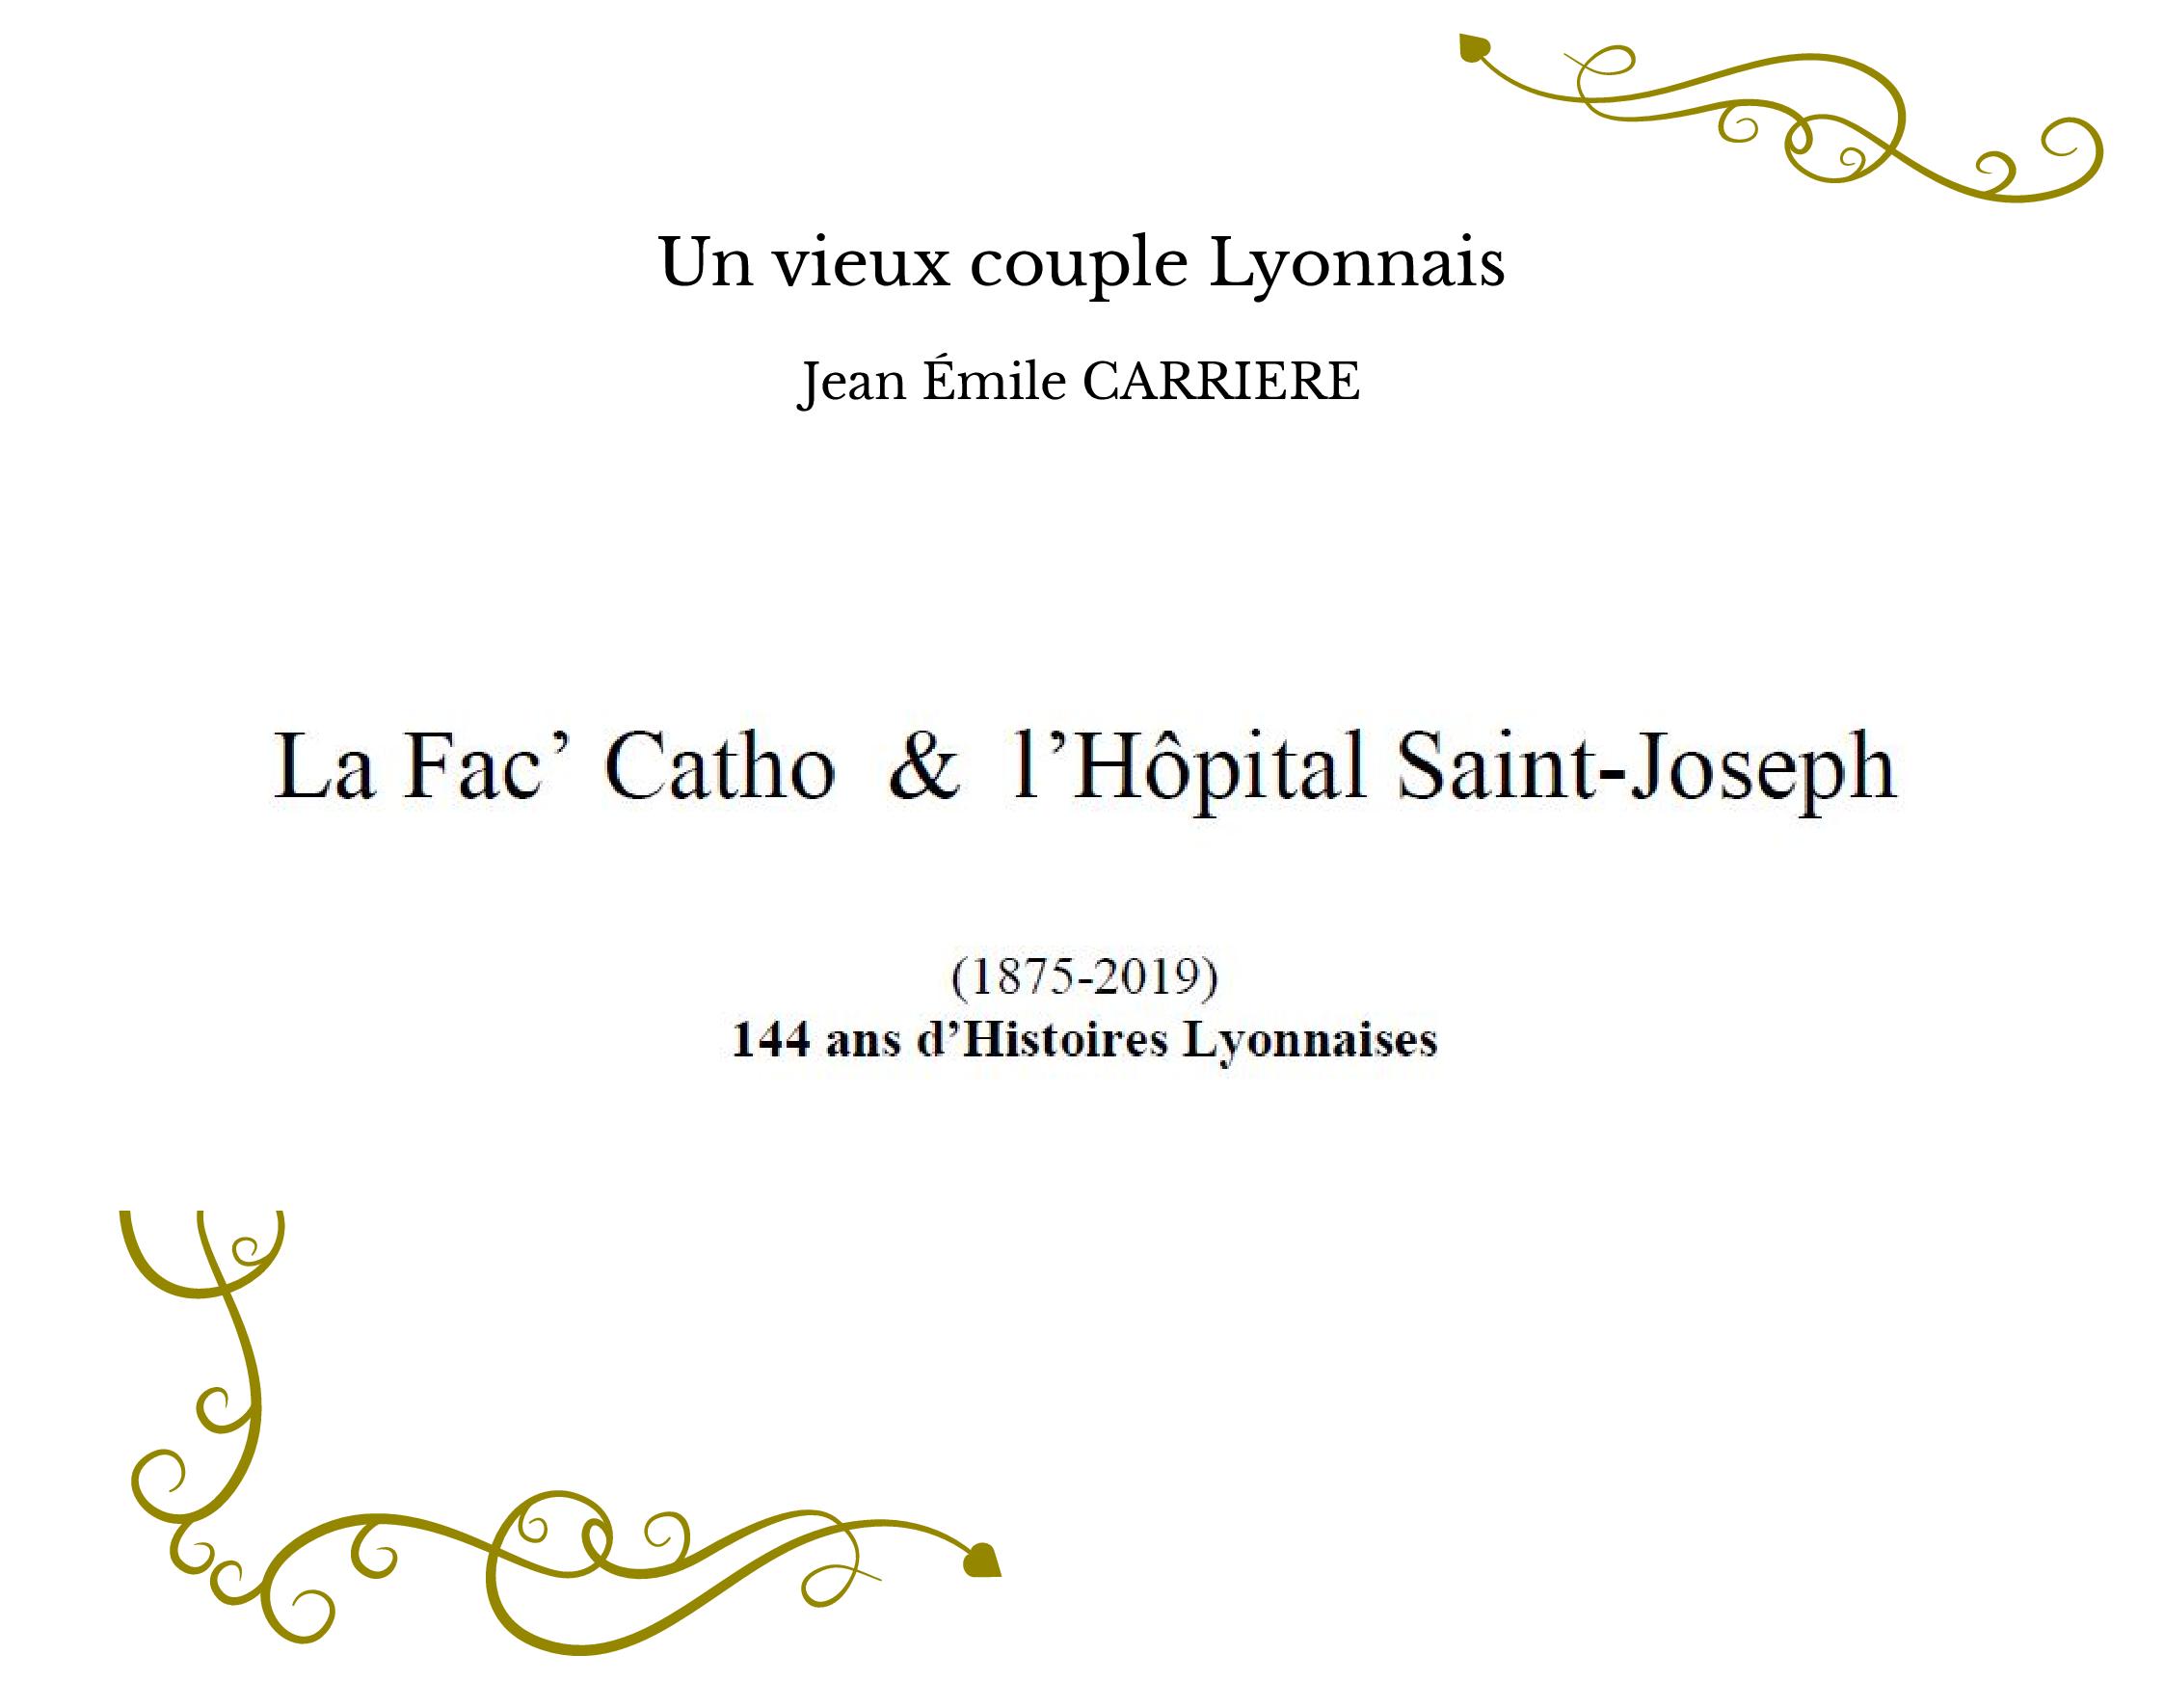 Un vieux couple Lyonnais